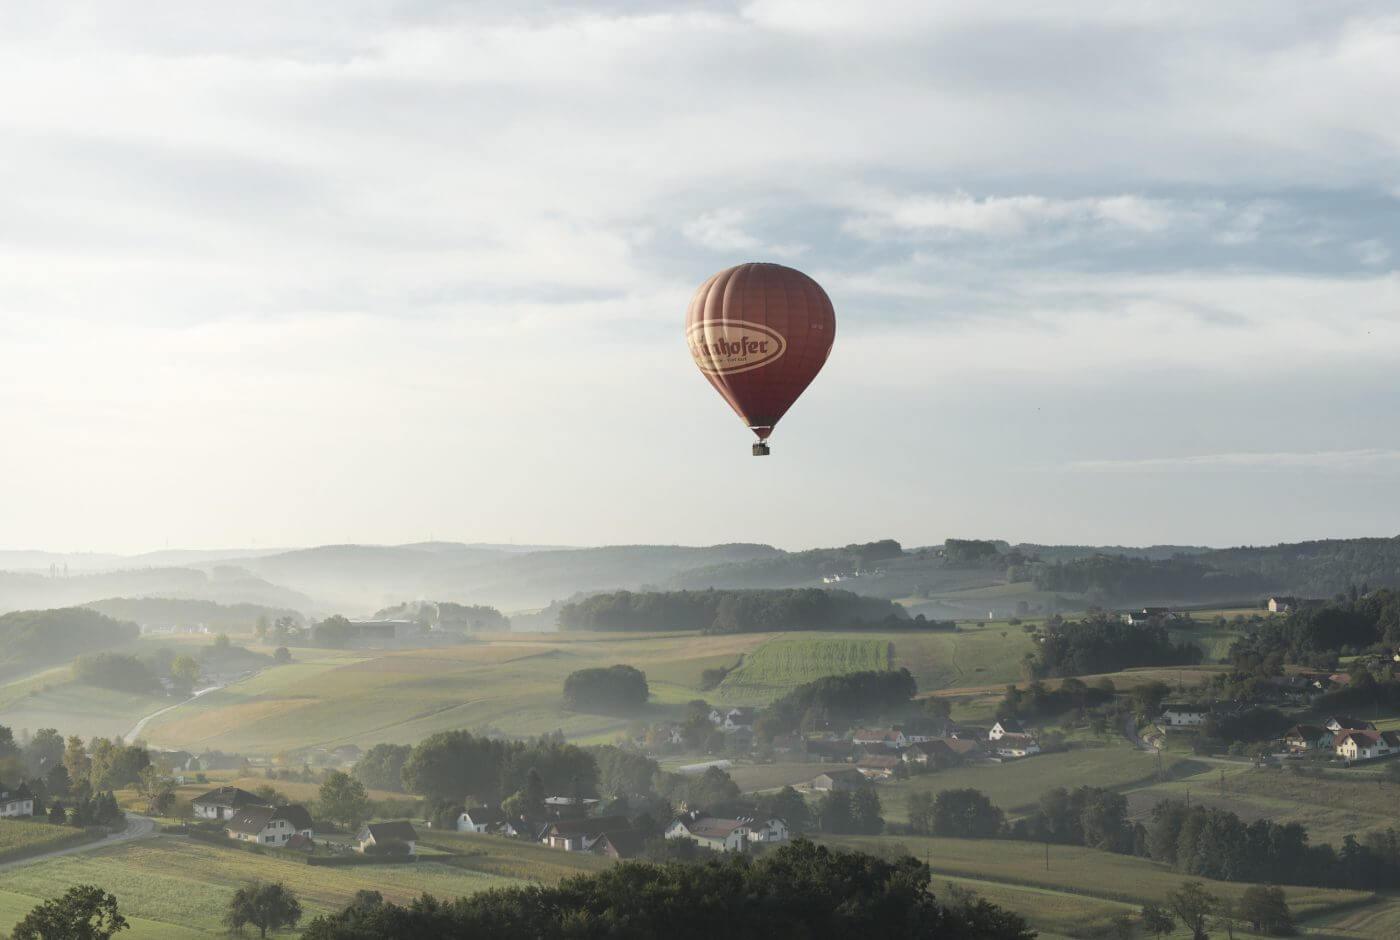 Ballon, Landschaft, Oststeiermark, Apfelland